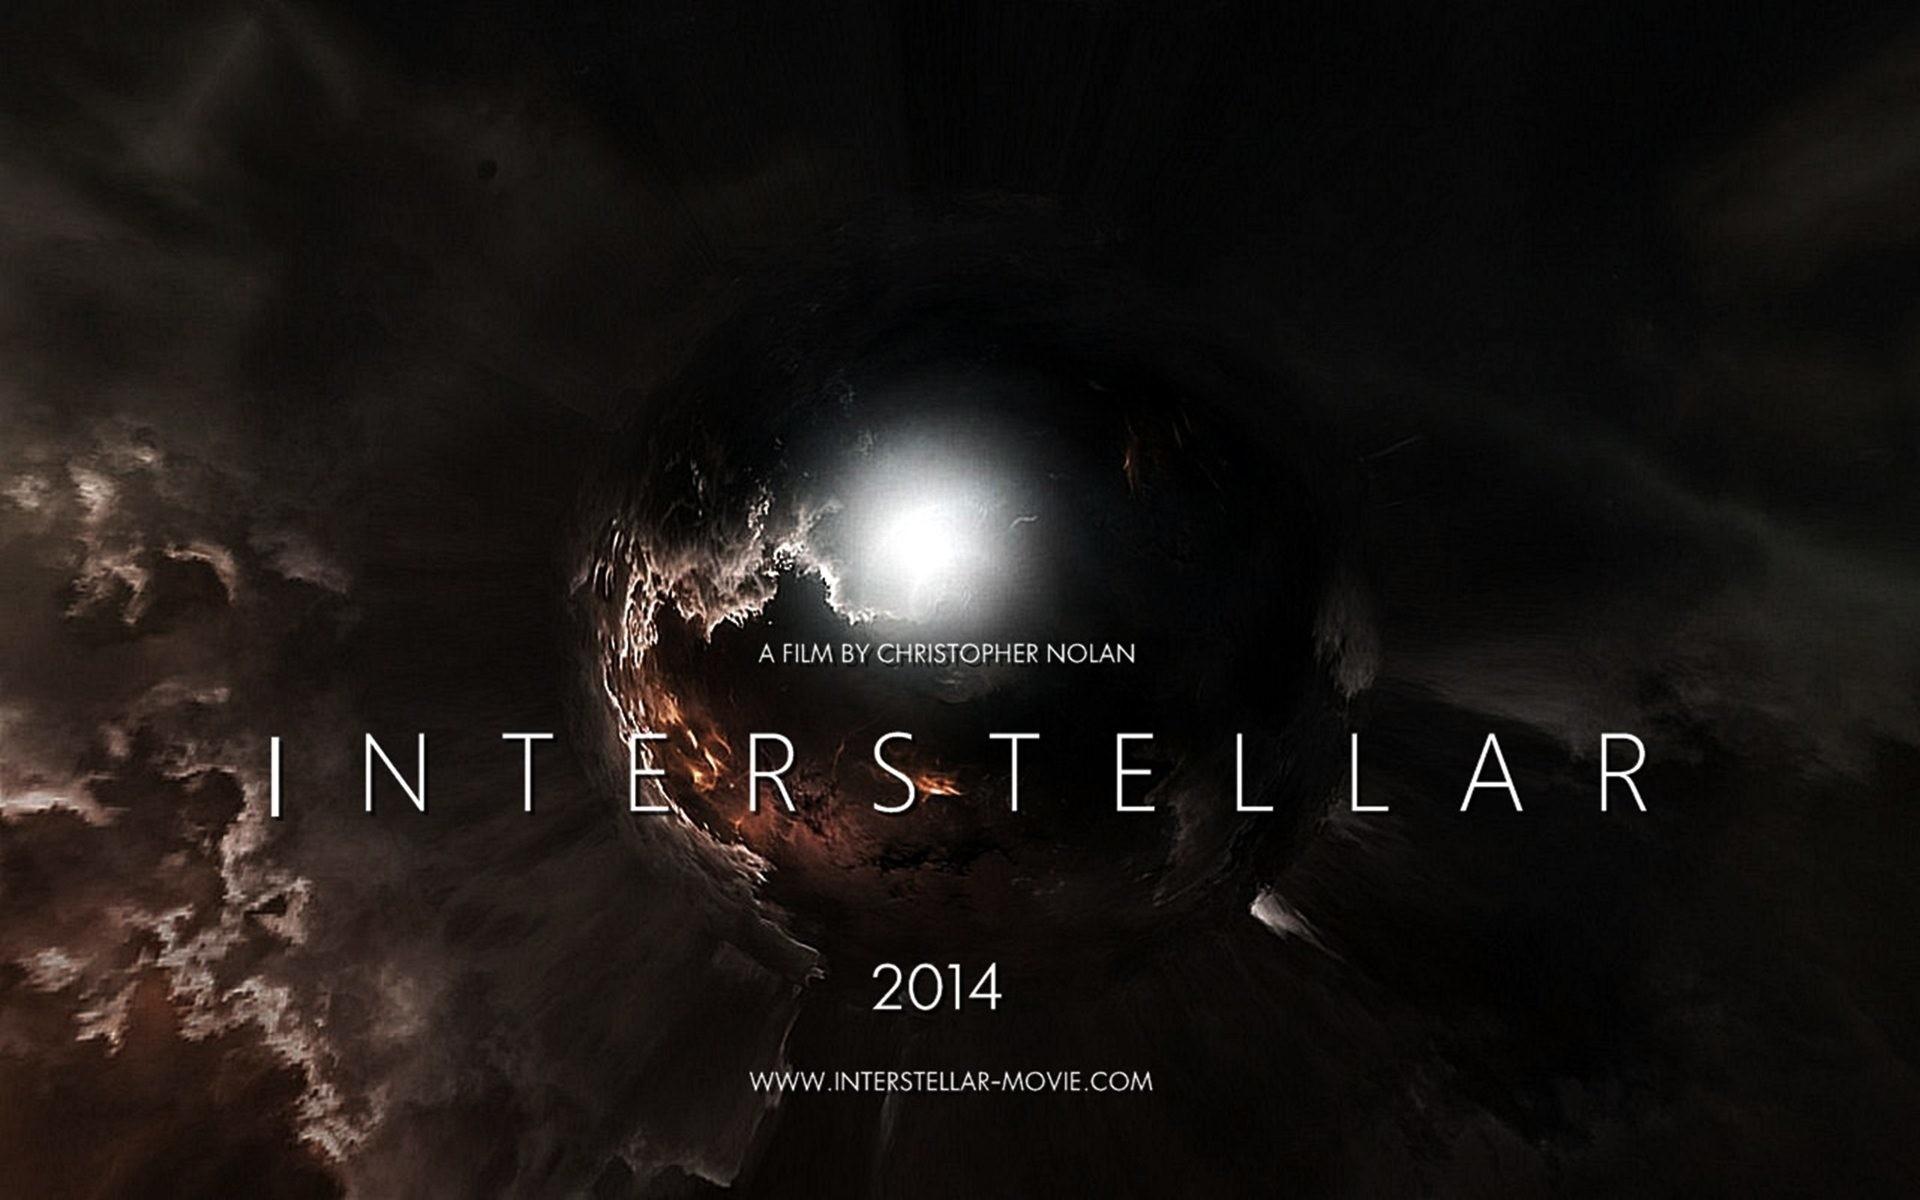 Interstellar Wallpaper (36 Wallpapers)